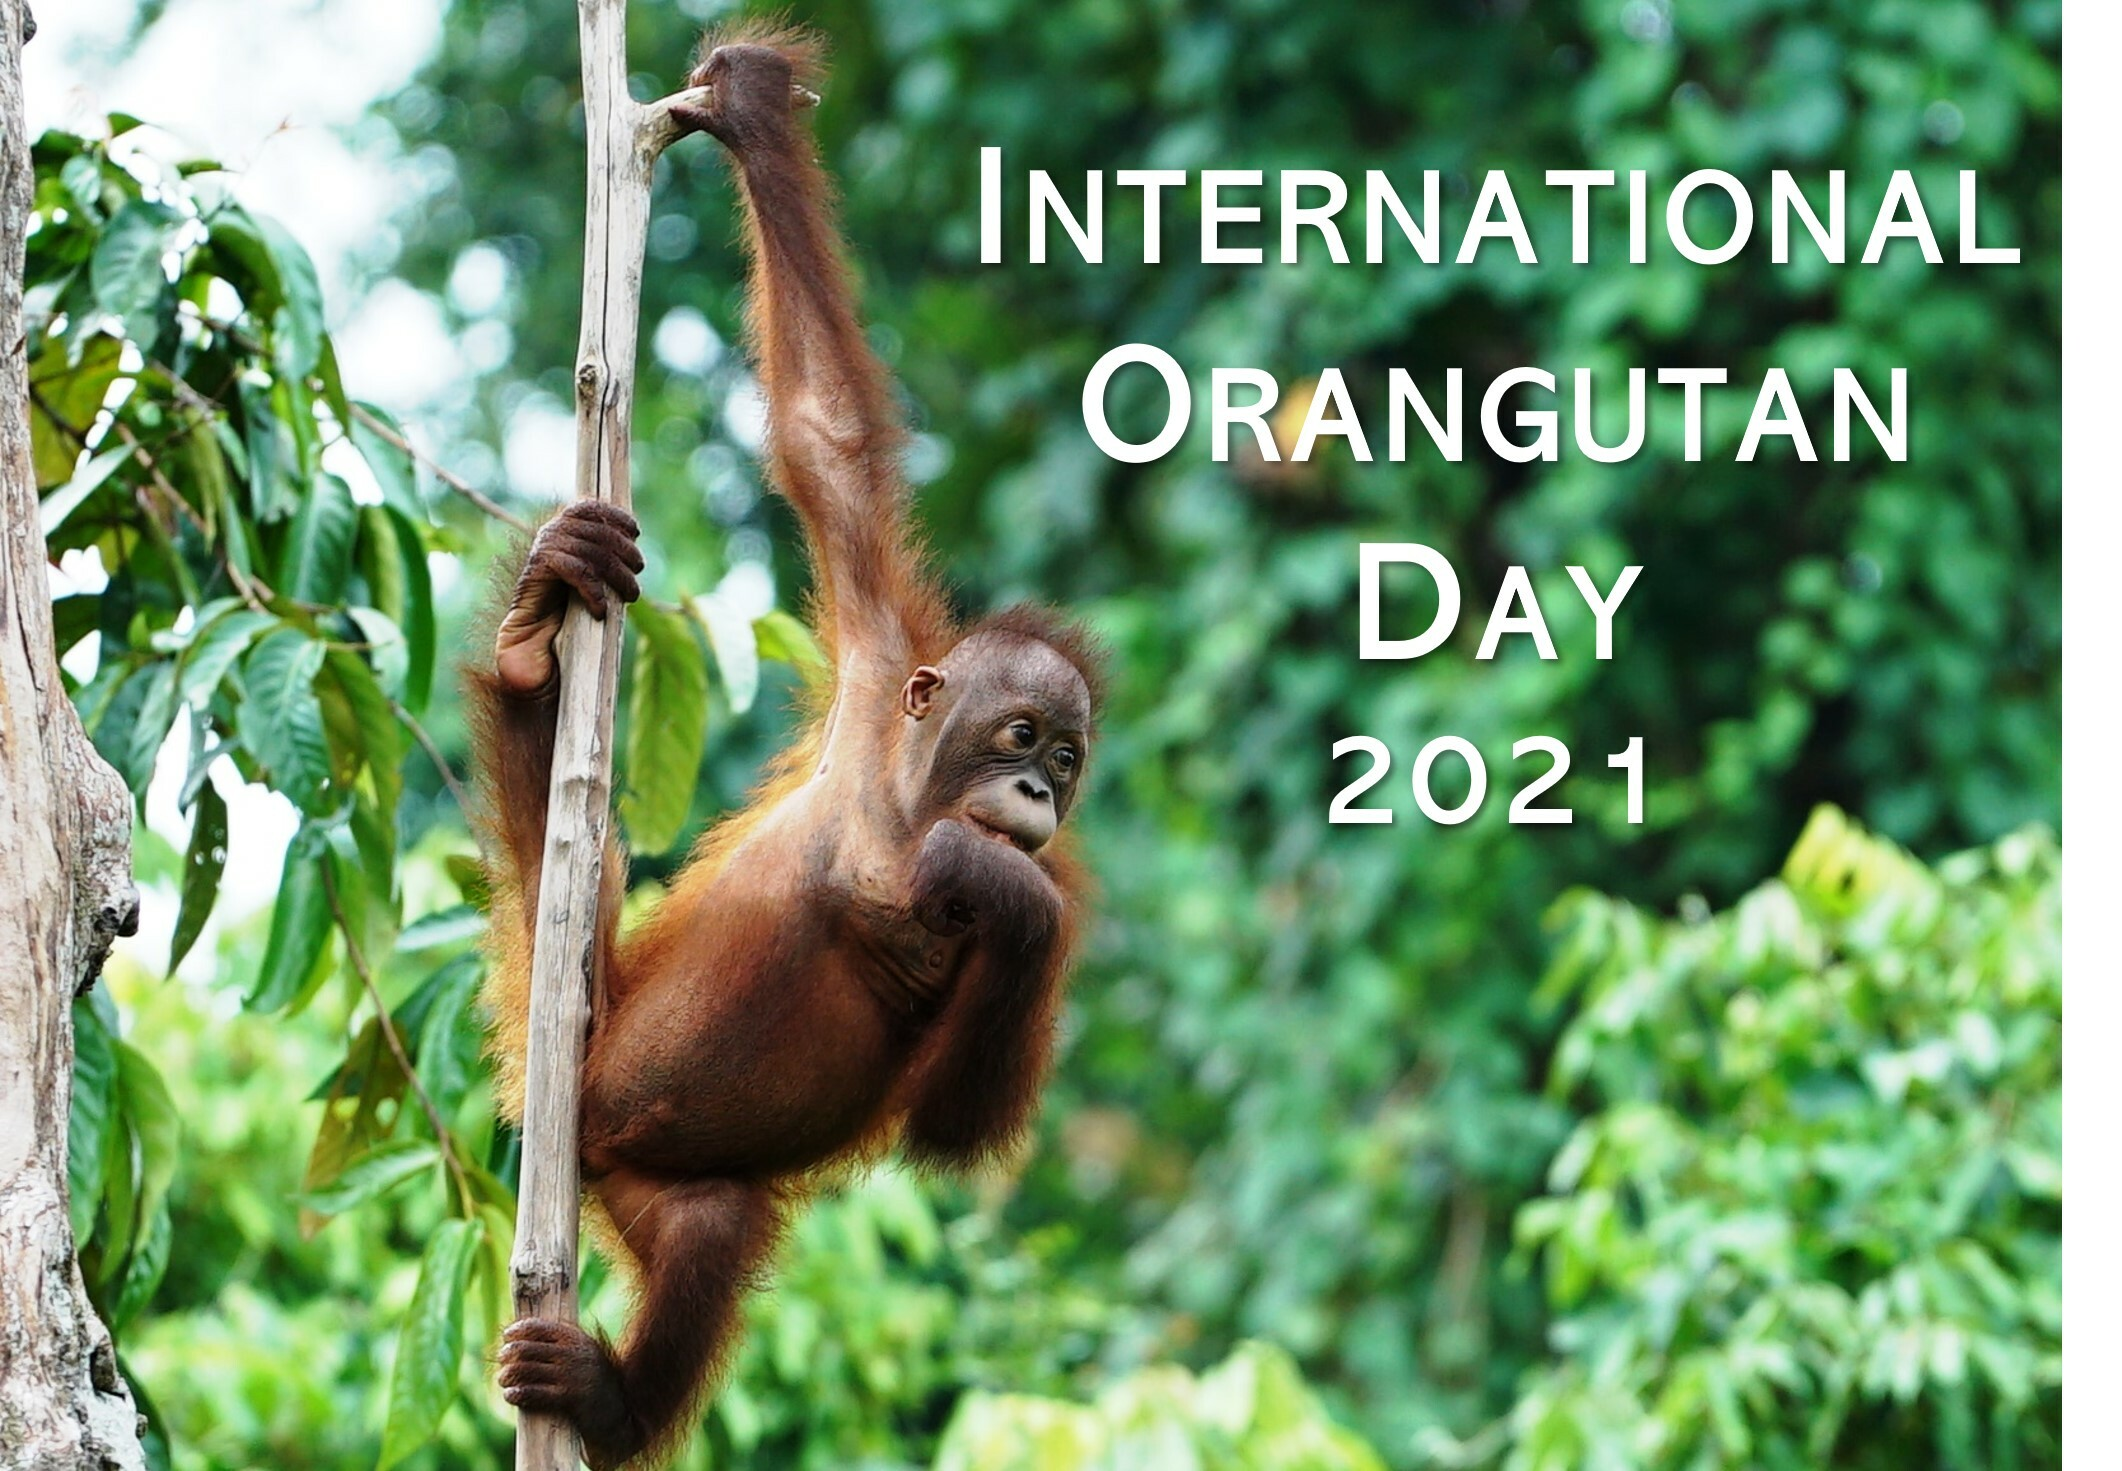 International Orangutan Day 2021 website mailshot